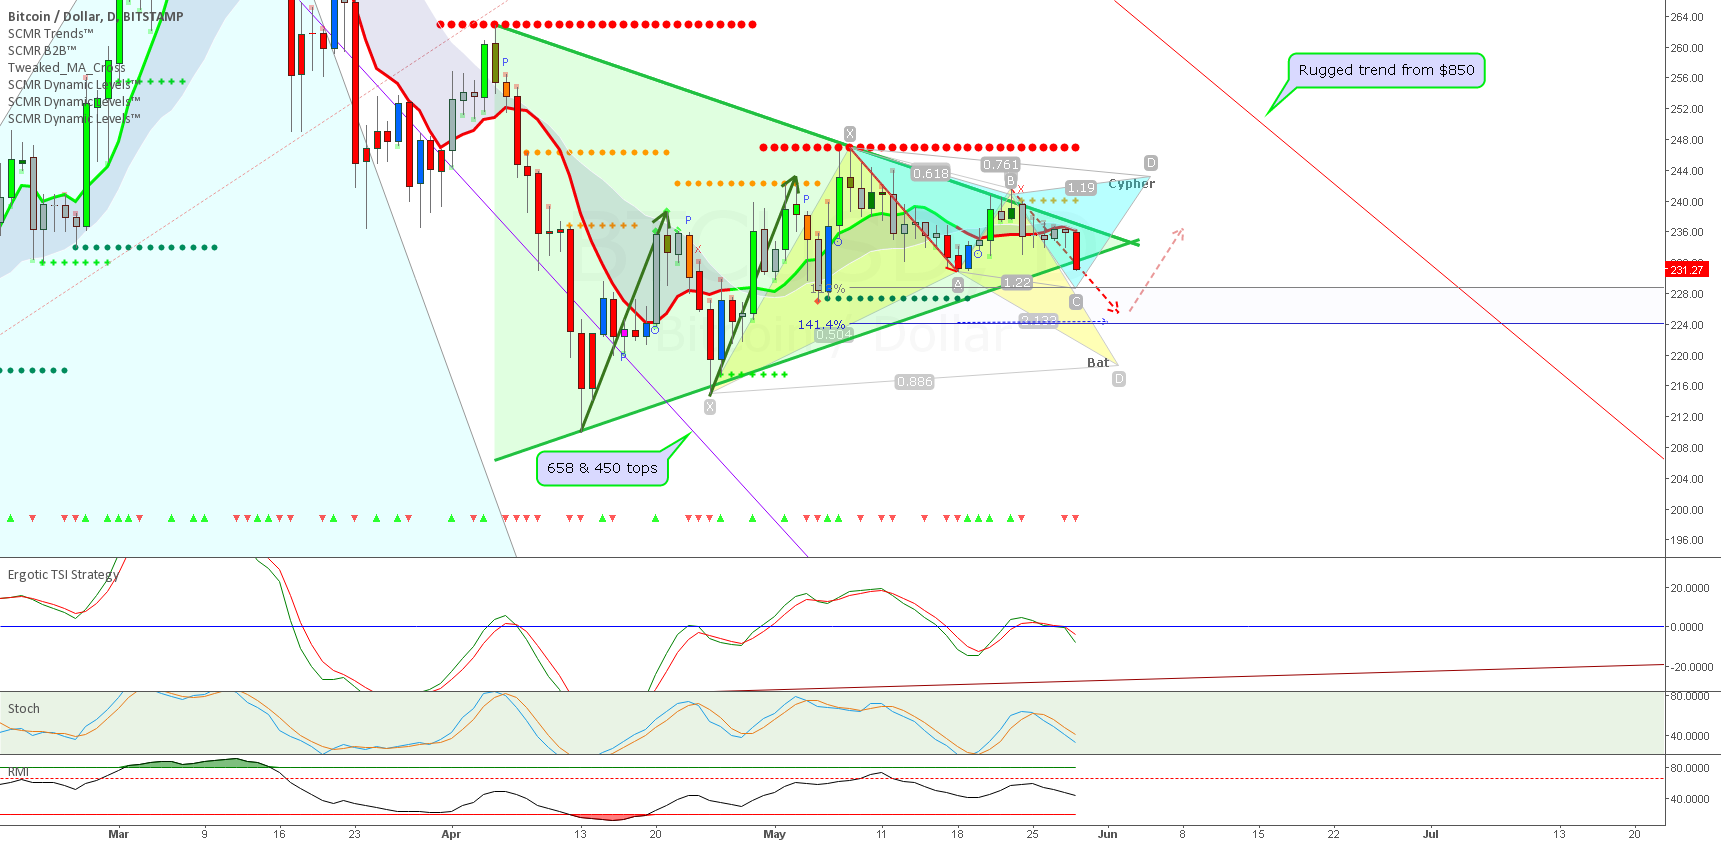 Symmetrical triangle break down looming + Advanced patterns